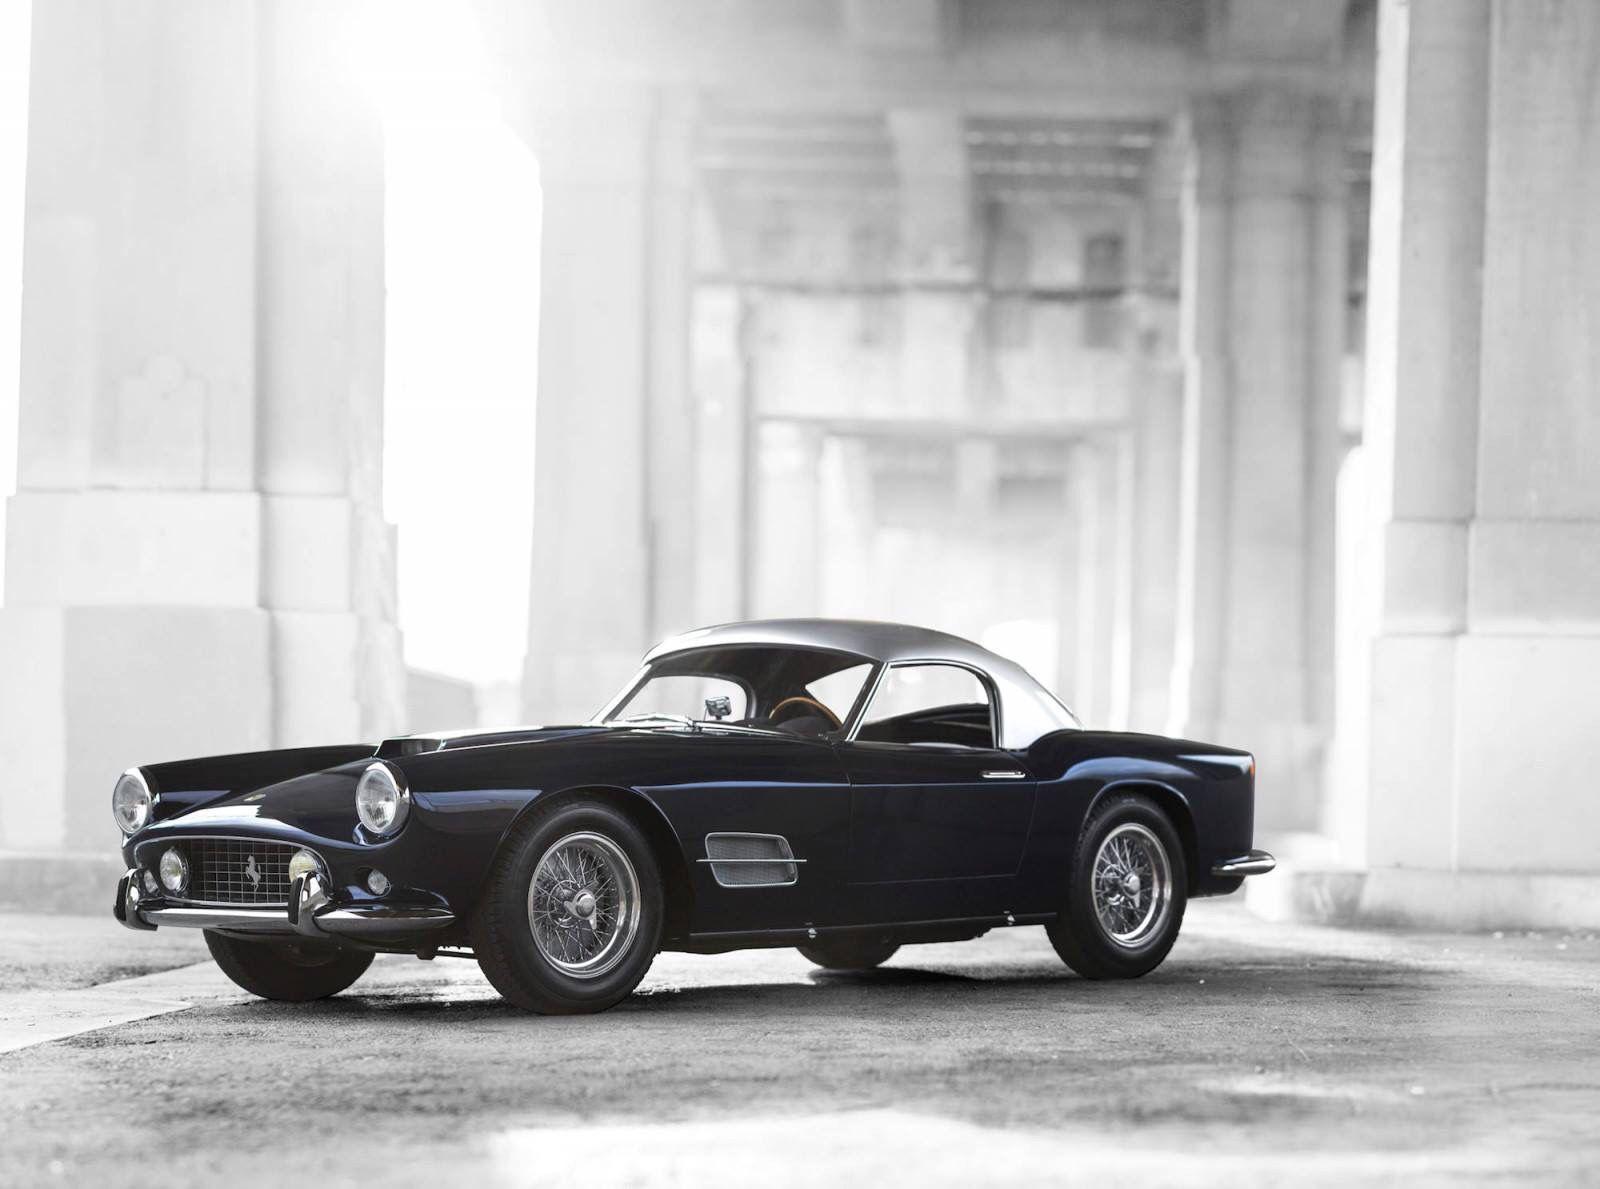 The 1957 Ferrari 250 GT LWB California Spider was the first car ...